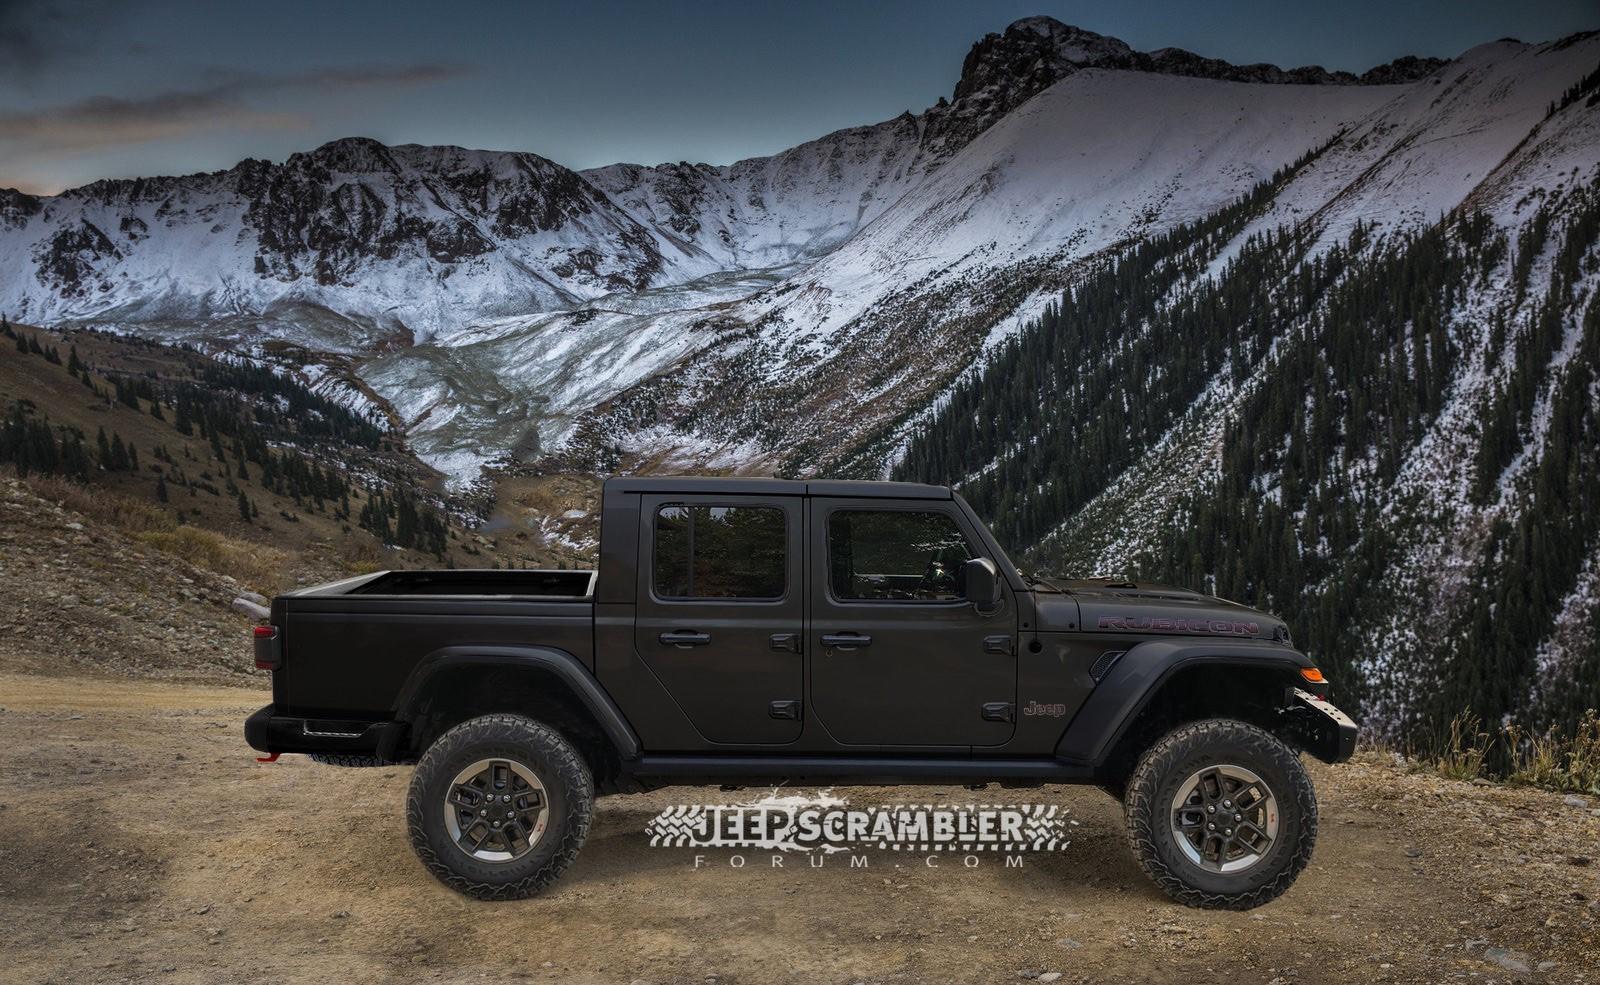 Jeep Scrambler Rubicon Pickup rendering (6)